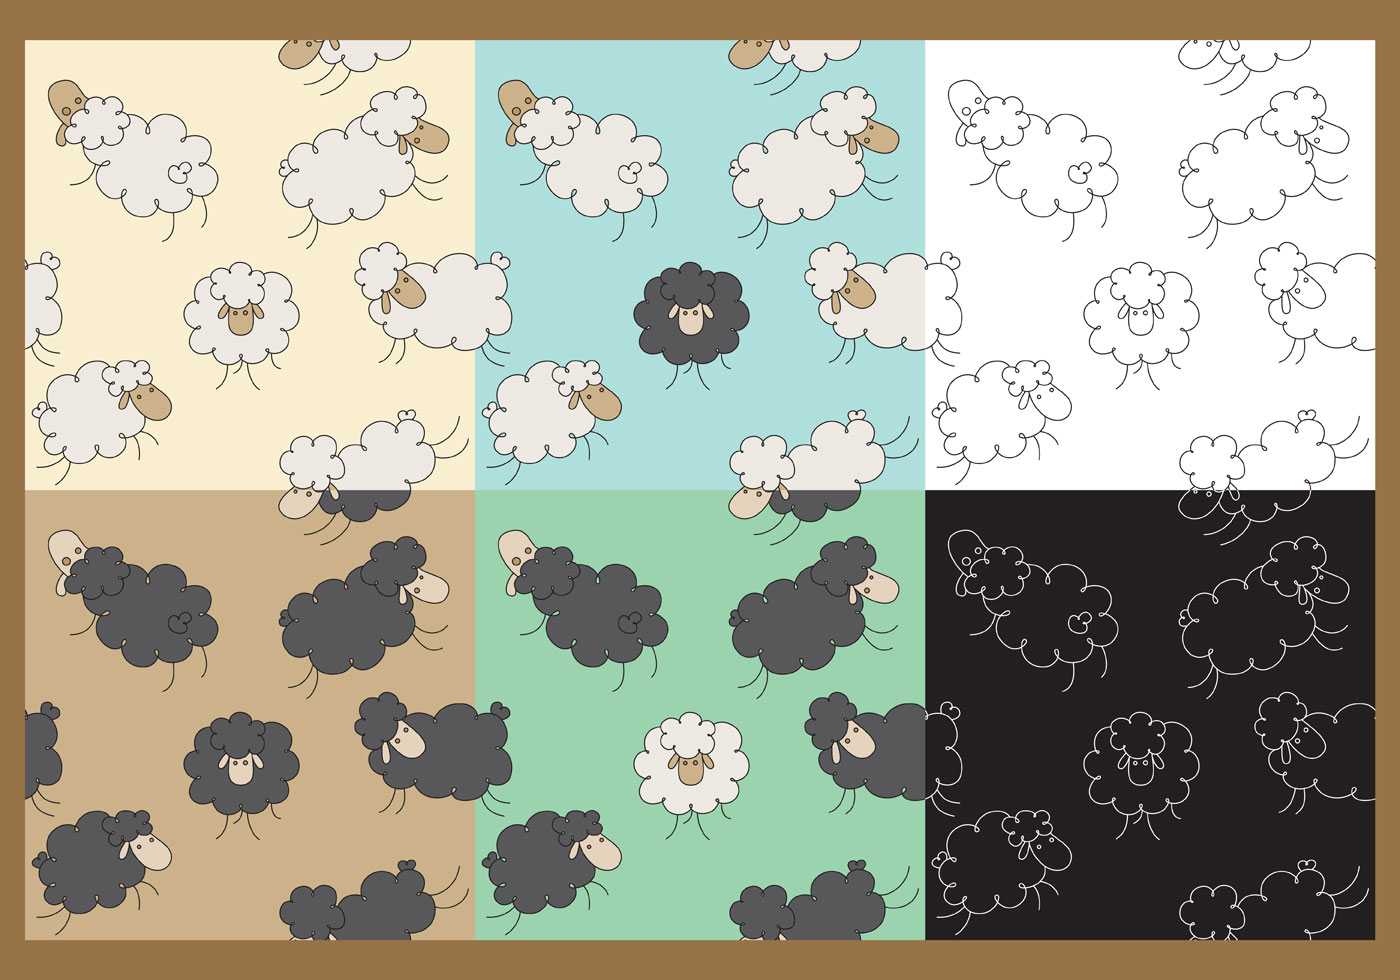 Wallpaper Doodle Cute Vector Sheep Patterns Download Free Vector Art Stock